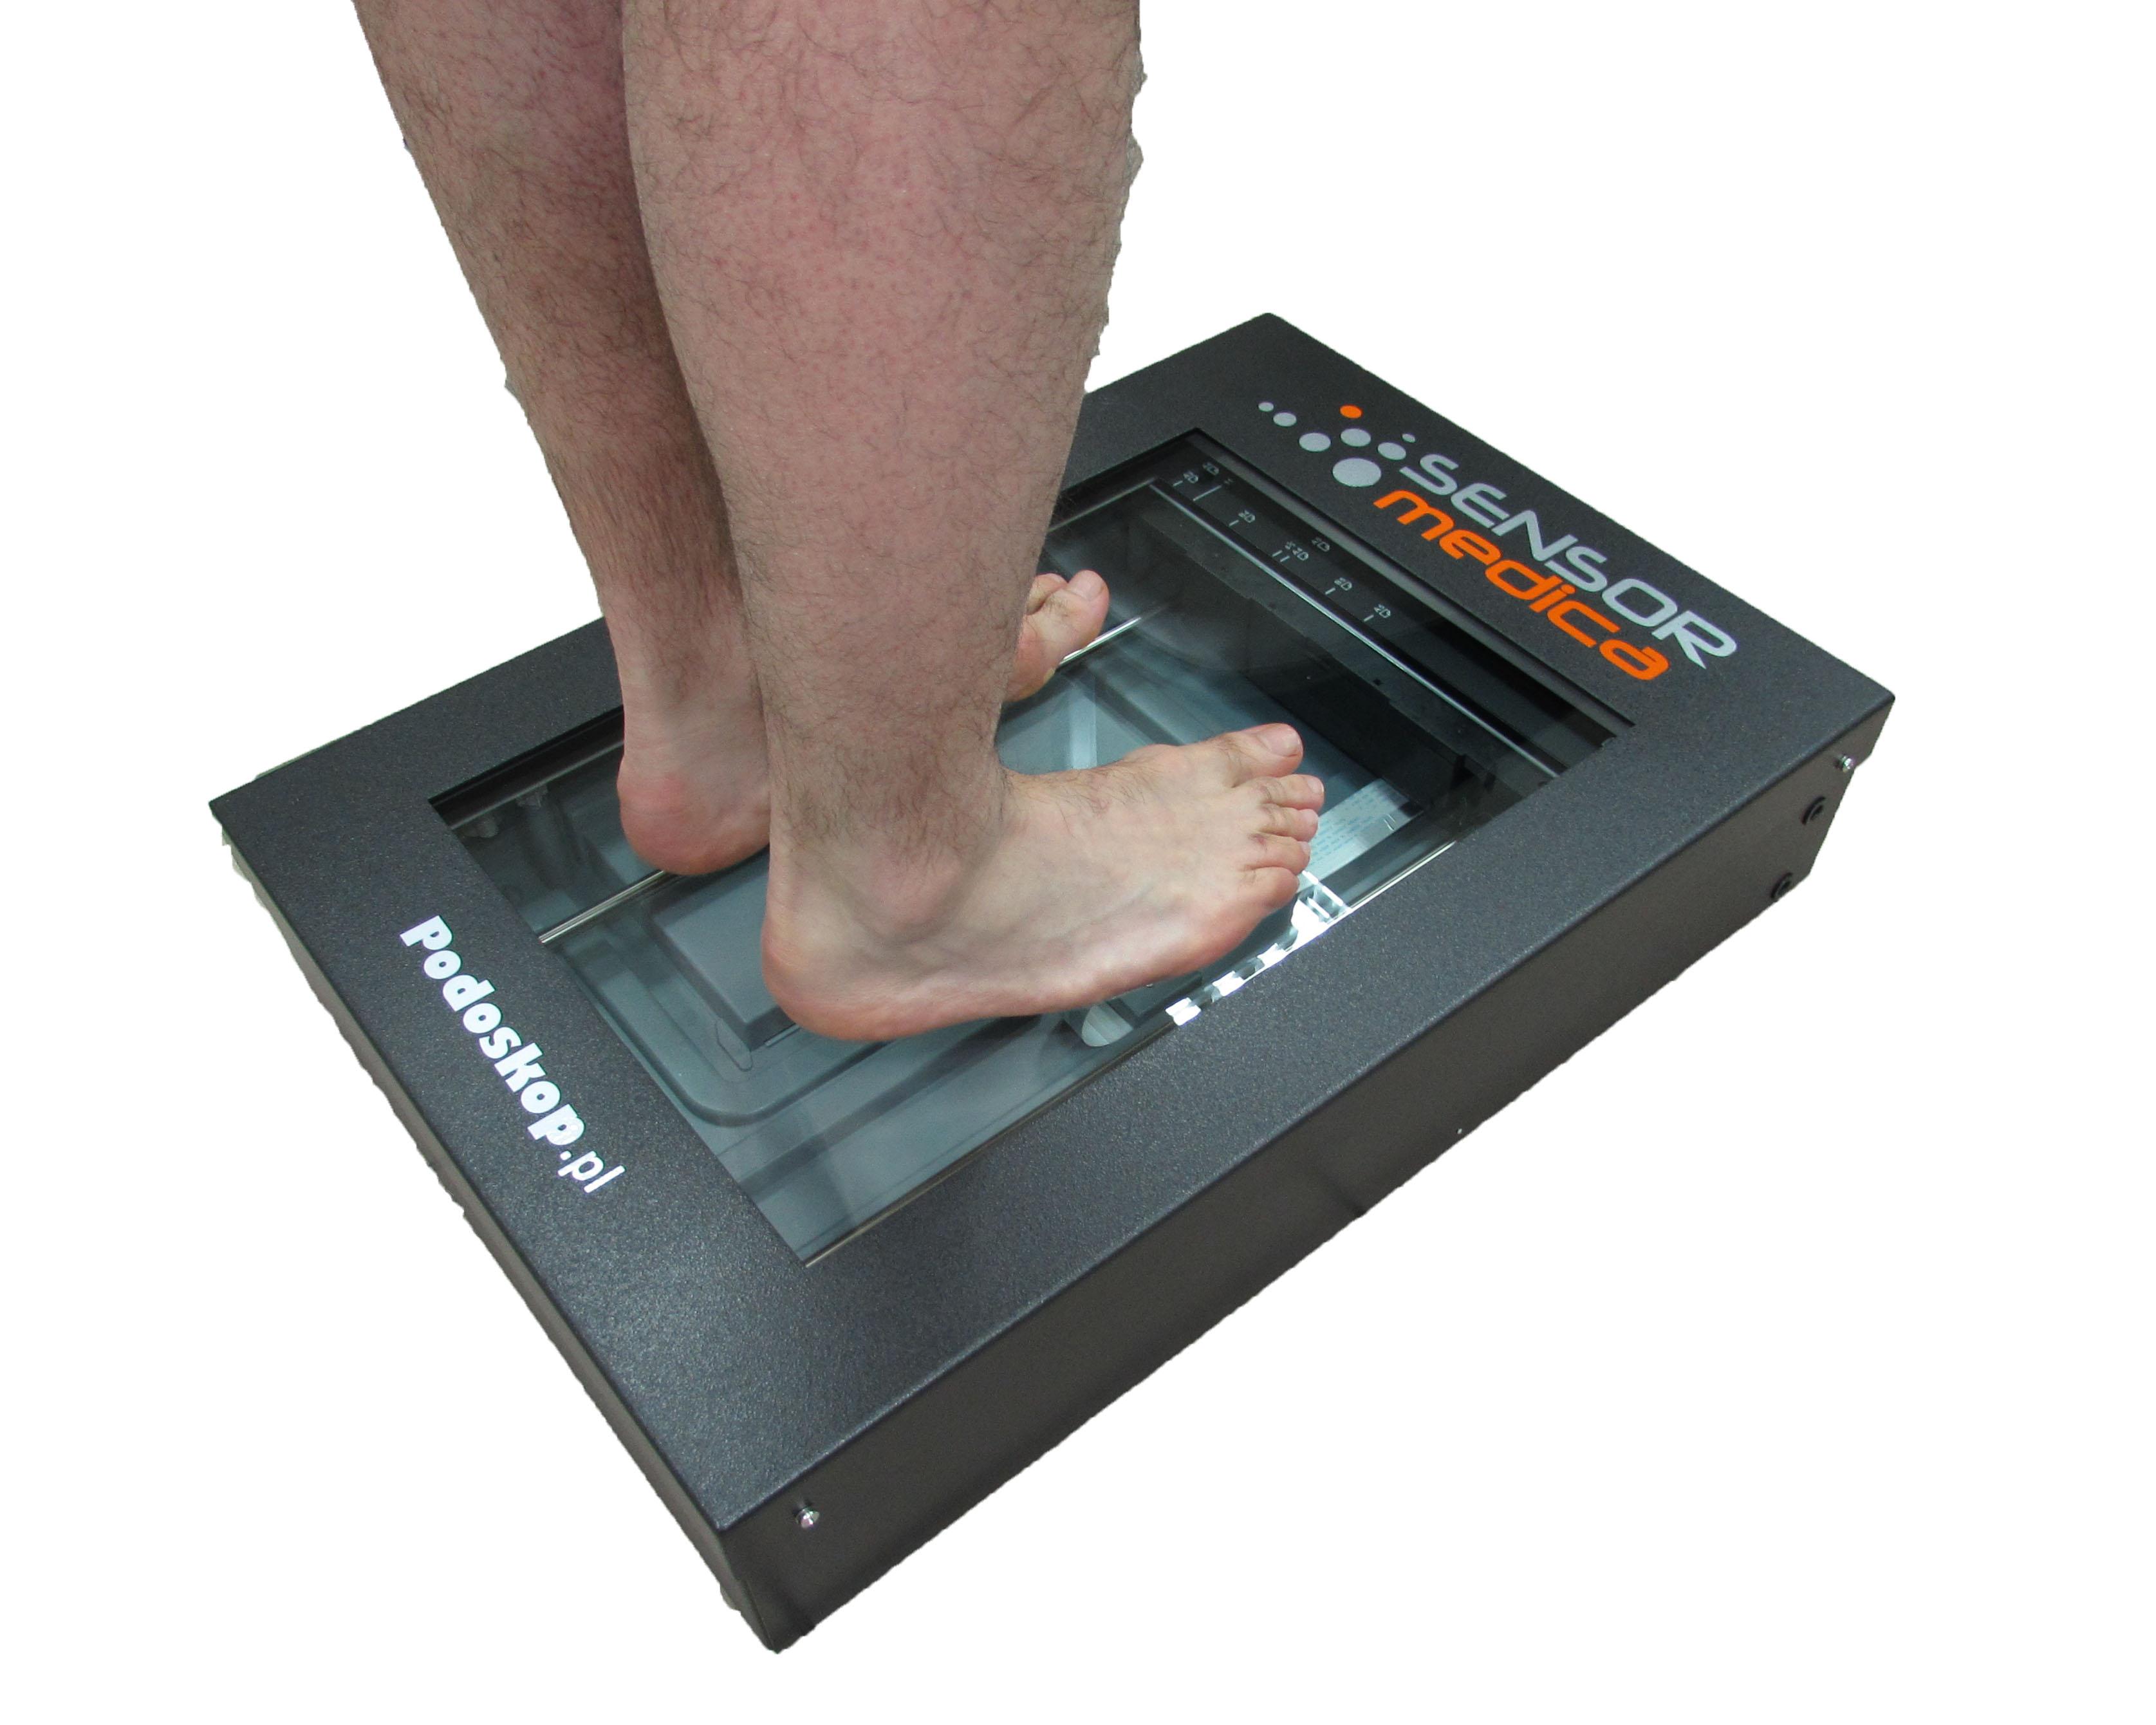 Podoscan 2D FootCAD